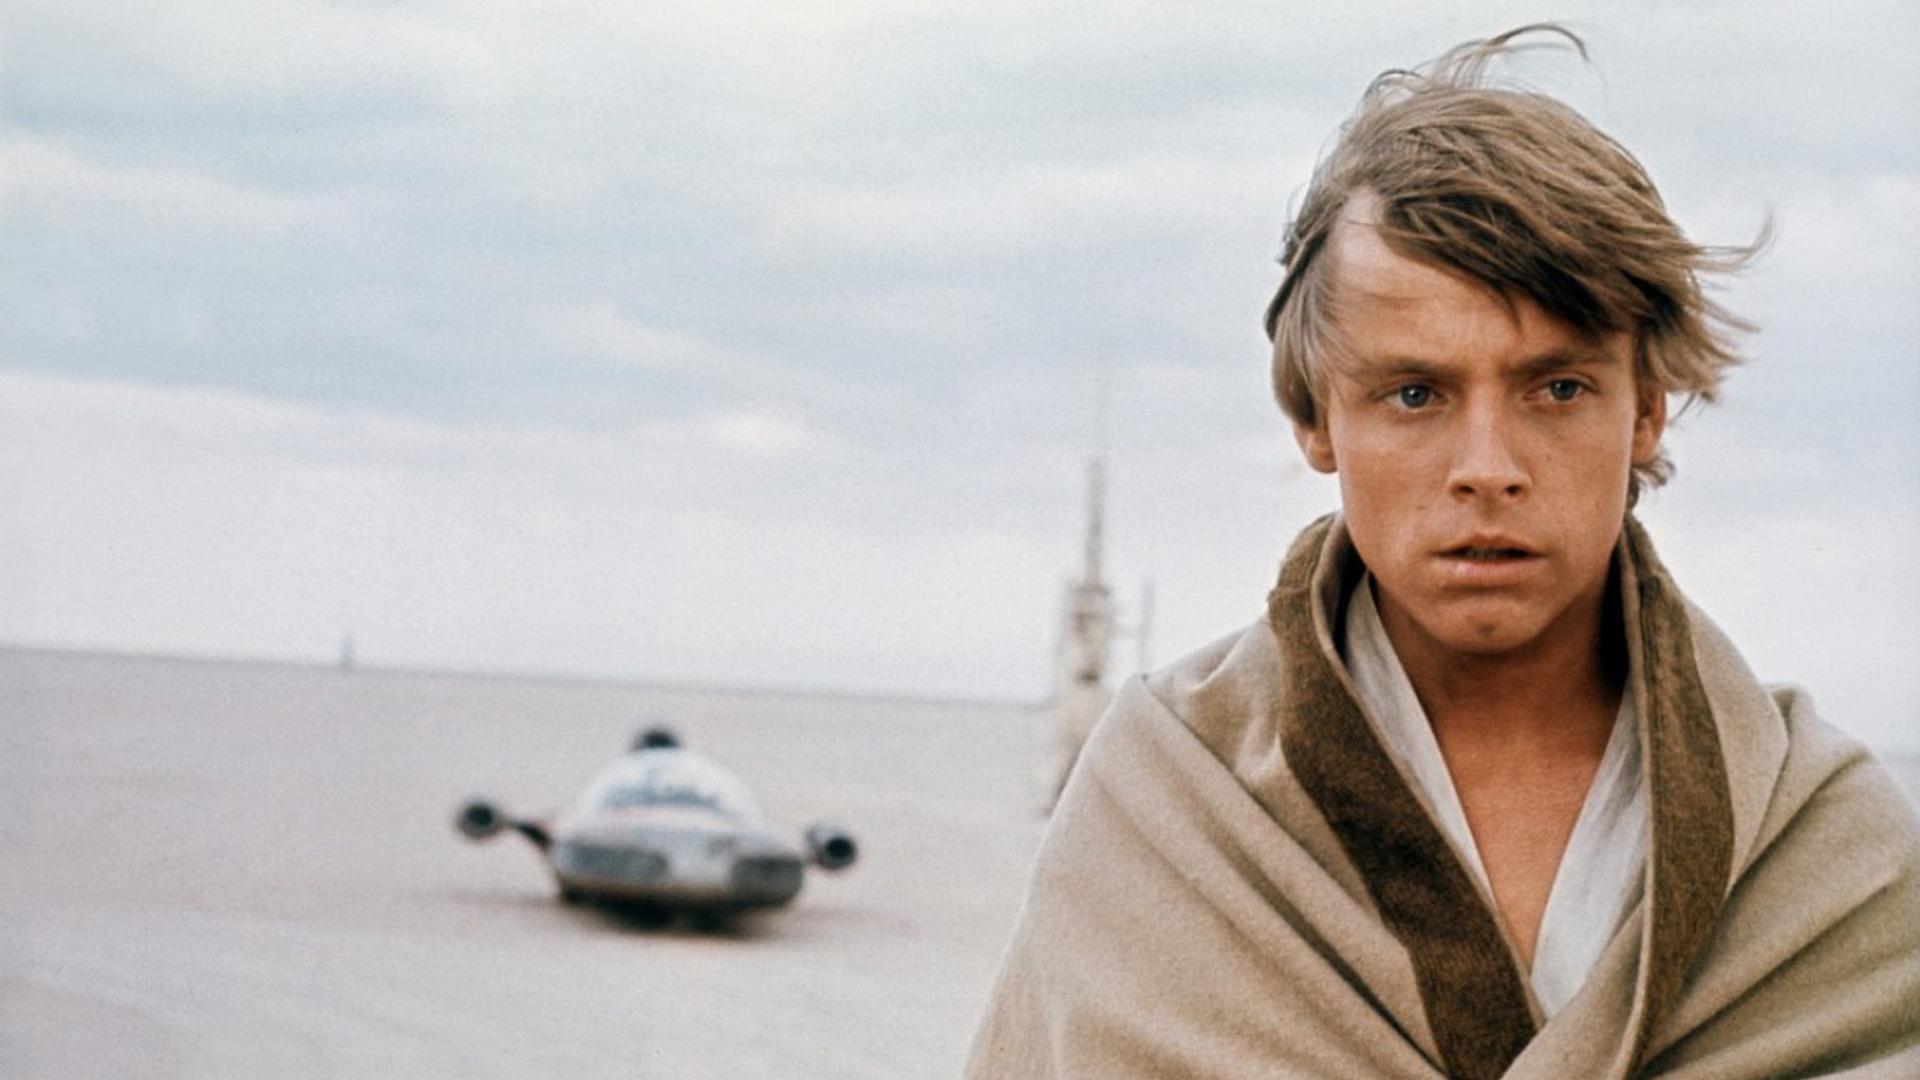 Star Wars Luke Skywalker On Tatooine Hd Wallpaper Luke Skywalker Star Wars Episode 4 1920x1080 Wallpaper Teahub Io